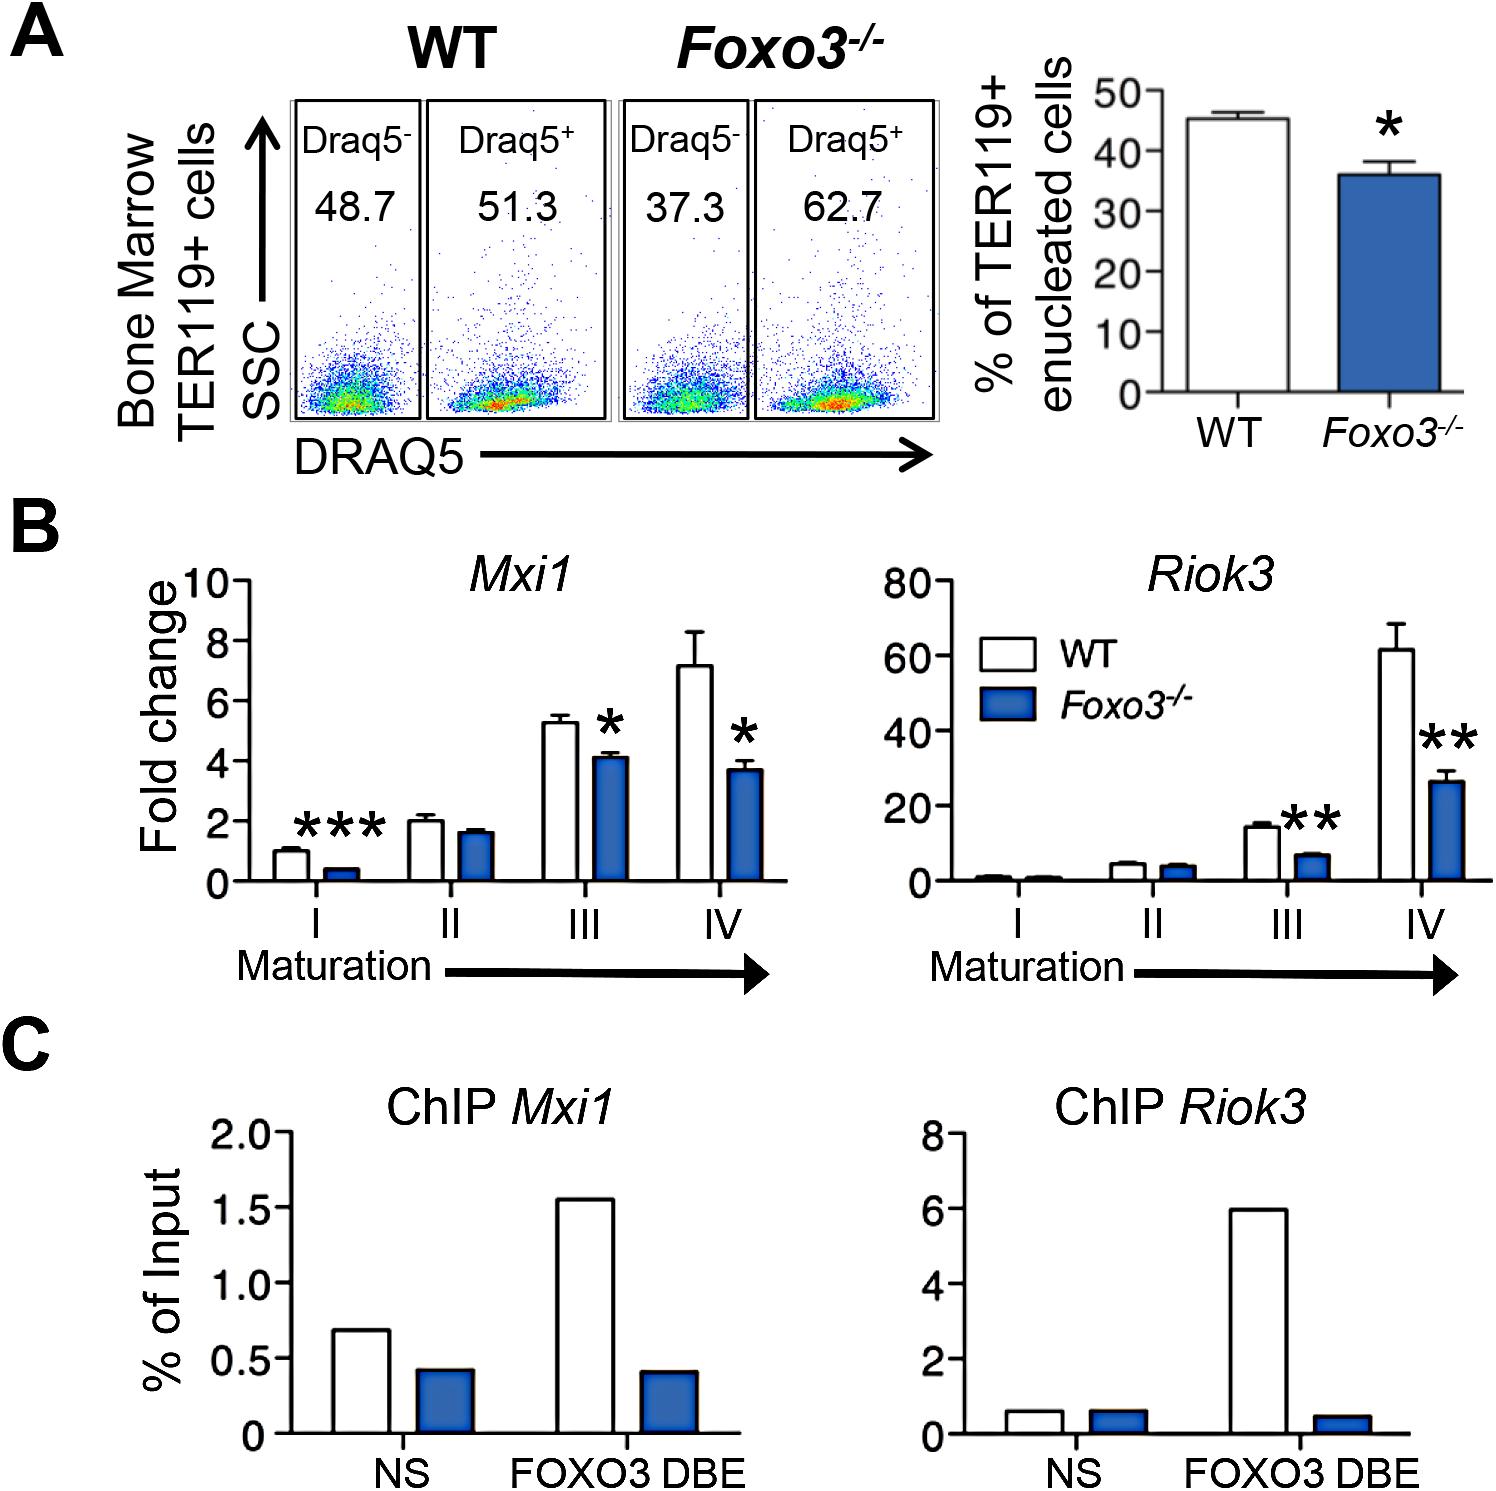 Impaired enucleation-related gene transcription in <i>Foxo3</i><sup><i>-/-</i></sup> bone marrow erythroblasts.